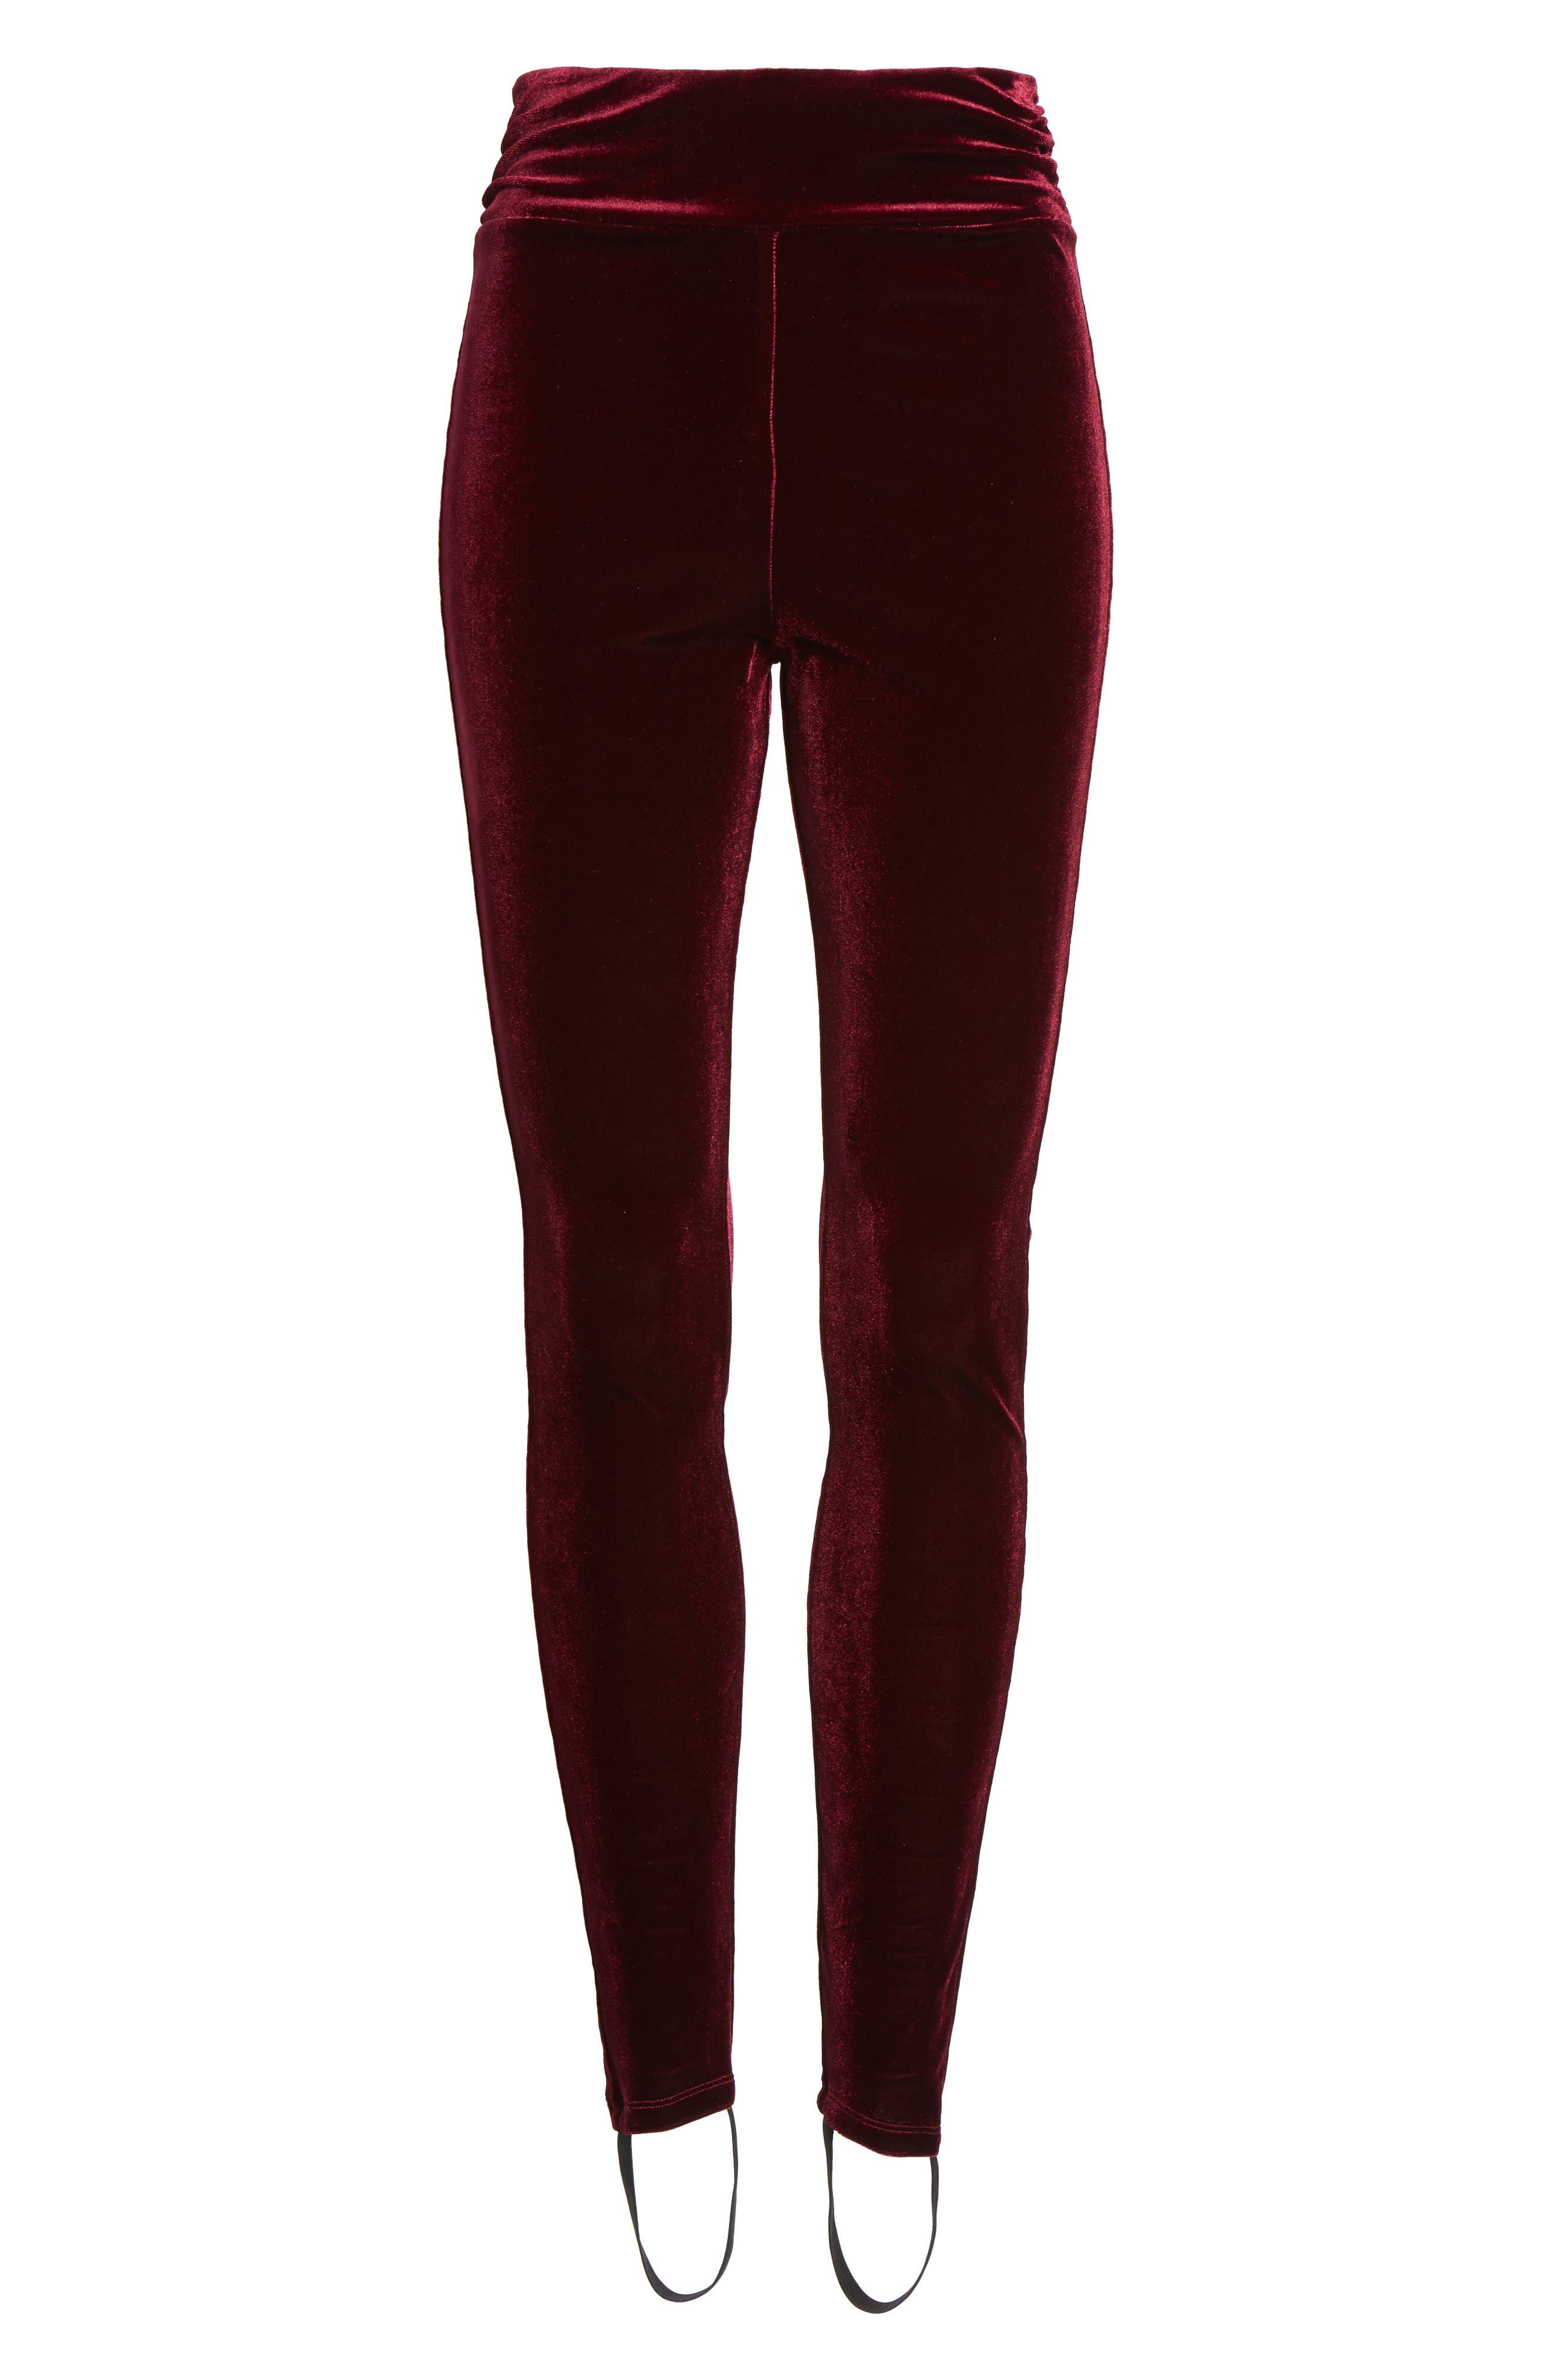 High Waist Velour Stirrup Pants,                             Alternate thumbnail 6, color,                             Red Tannin